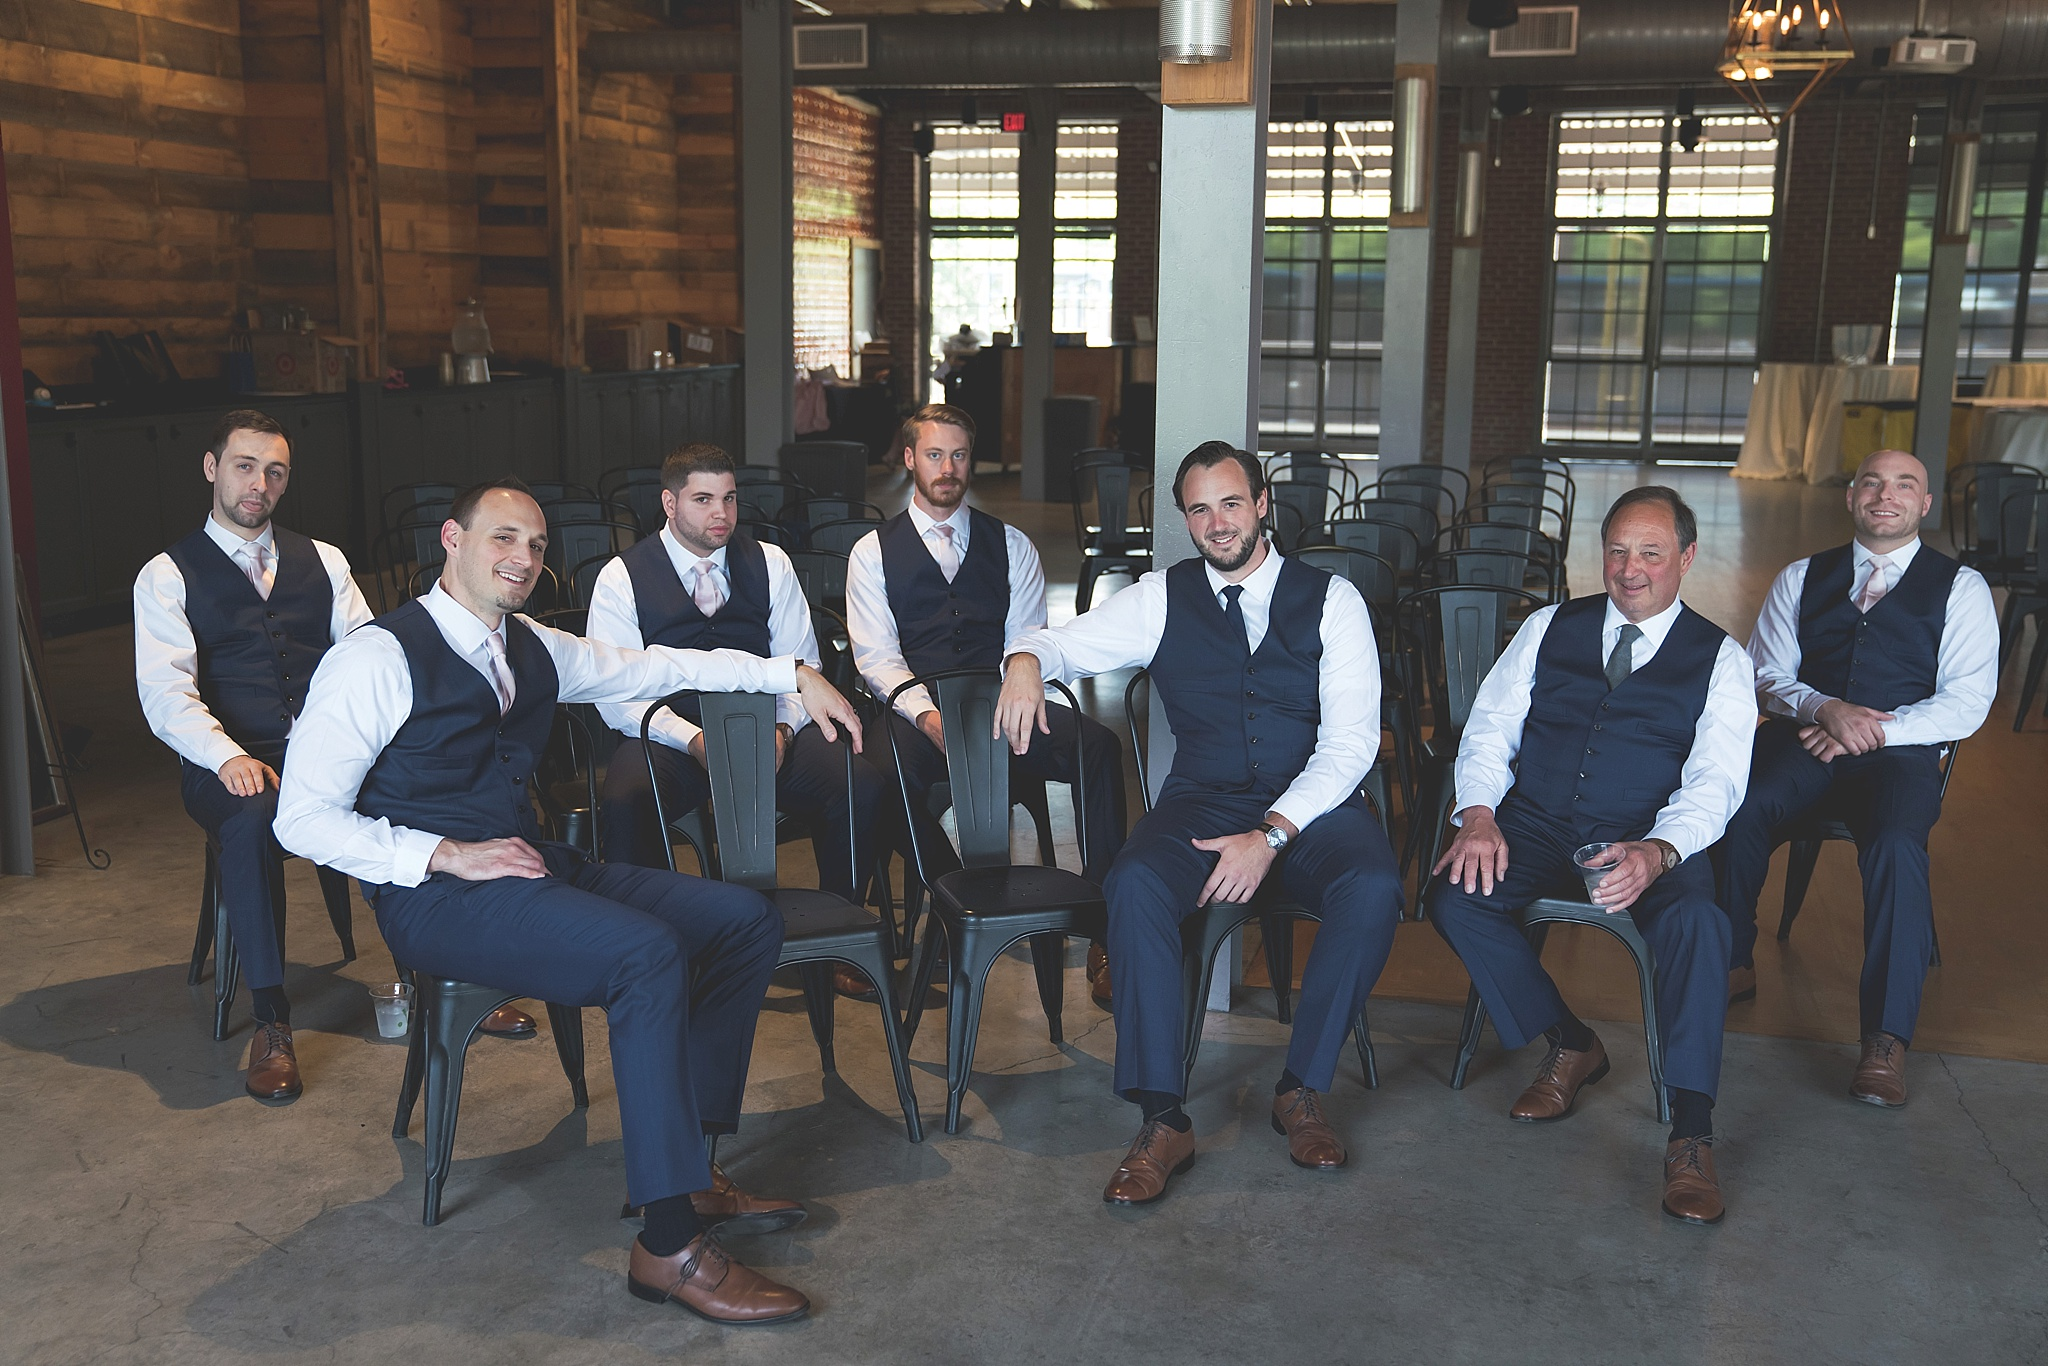 Rickhouse-Durham-NC-Wedding-Photographer-015.jpg